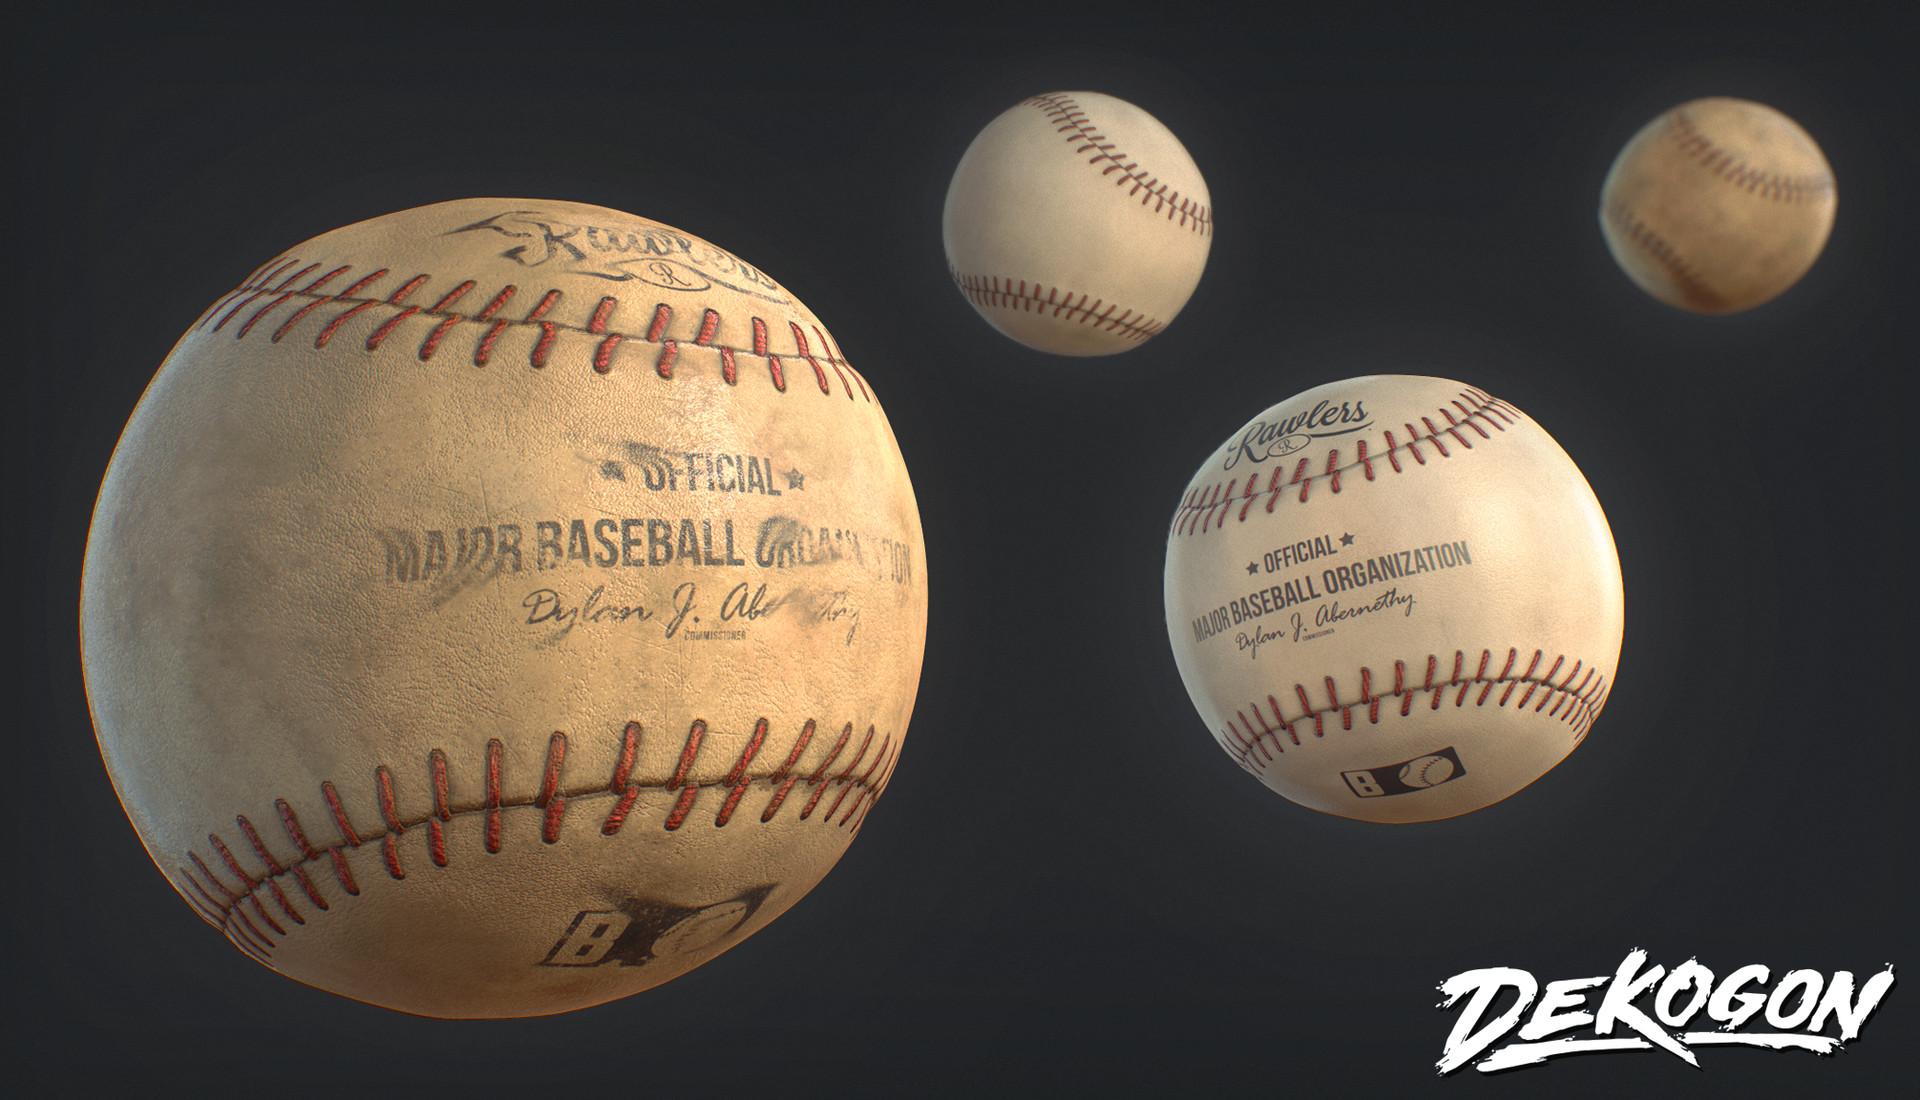 Dekogon - Baseball Asset